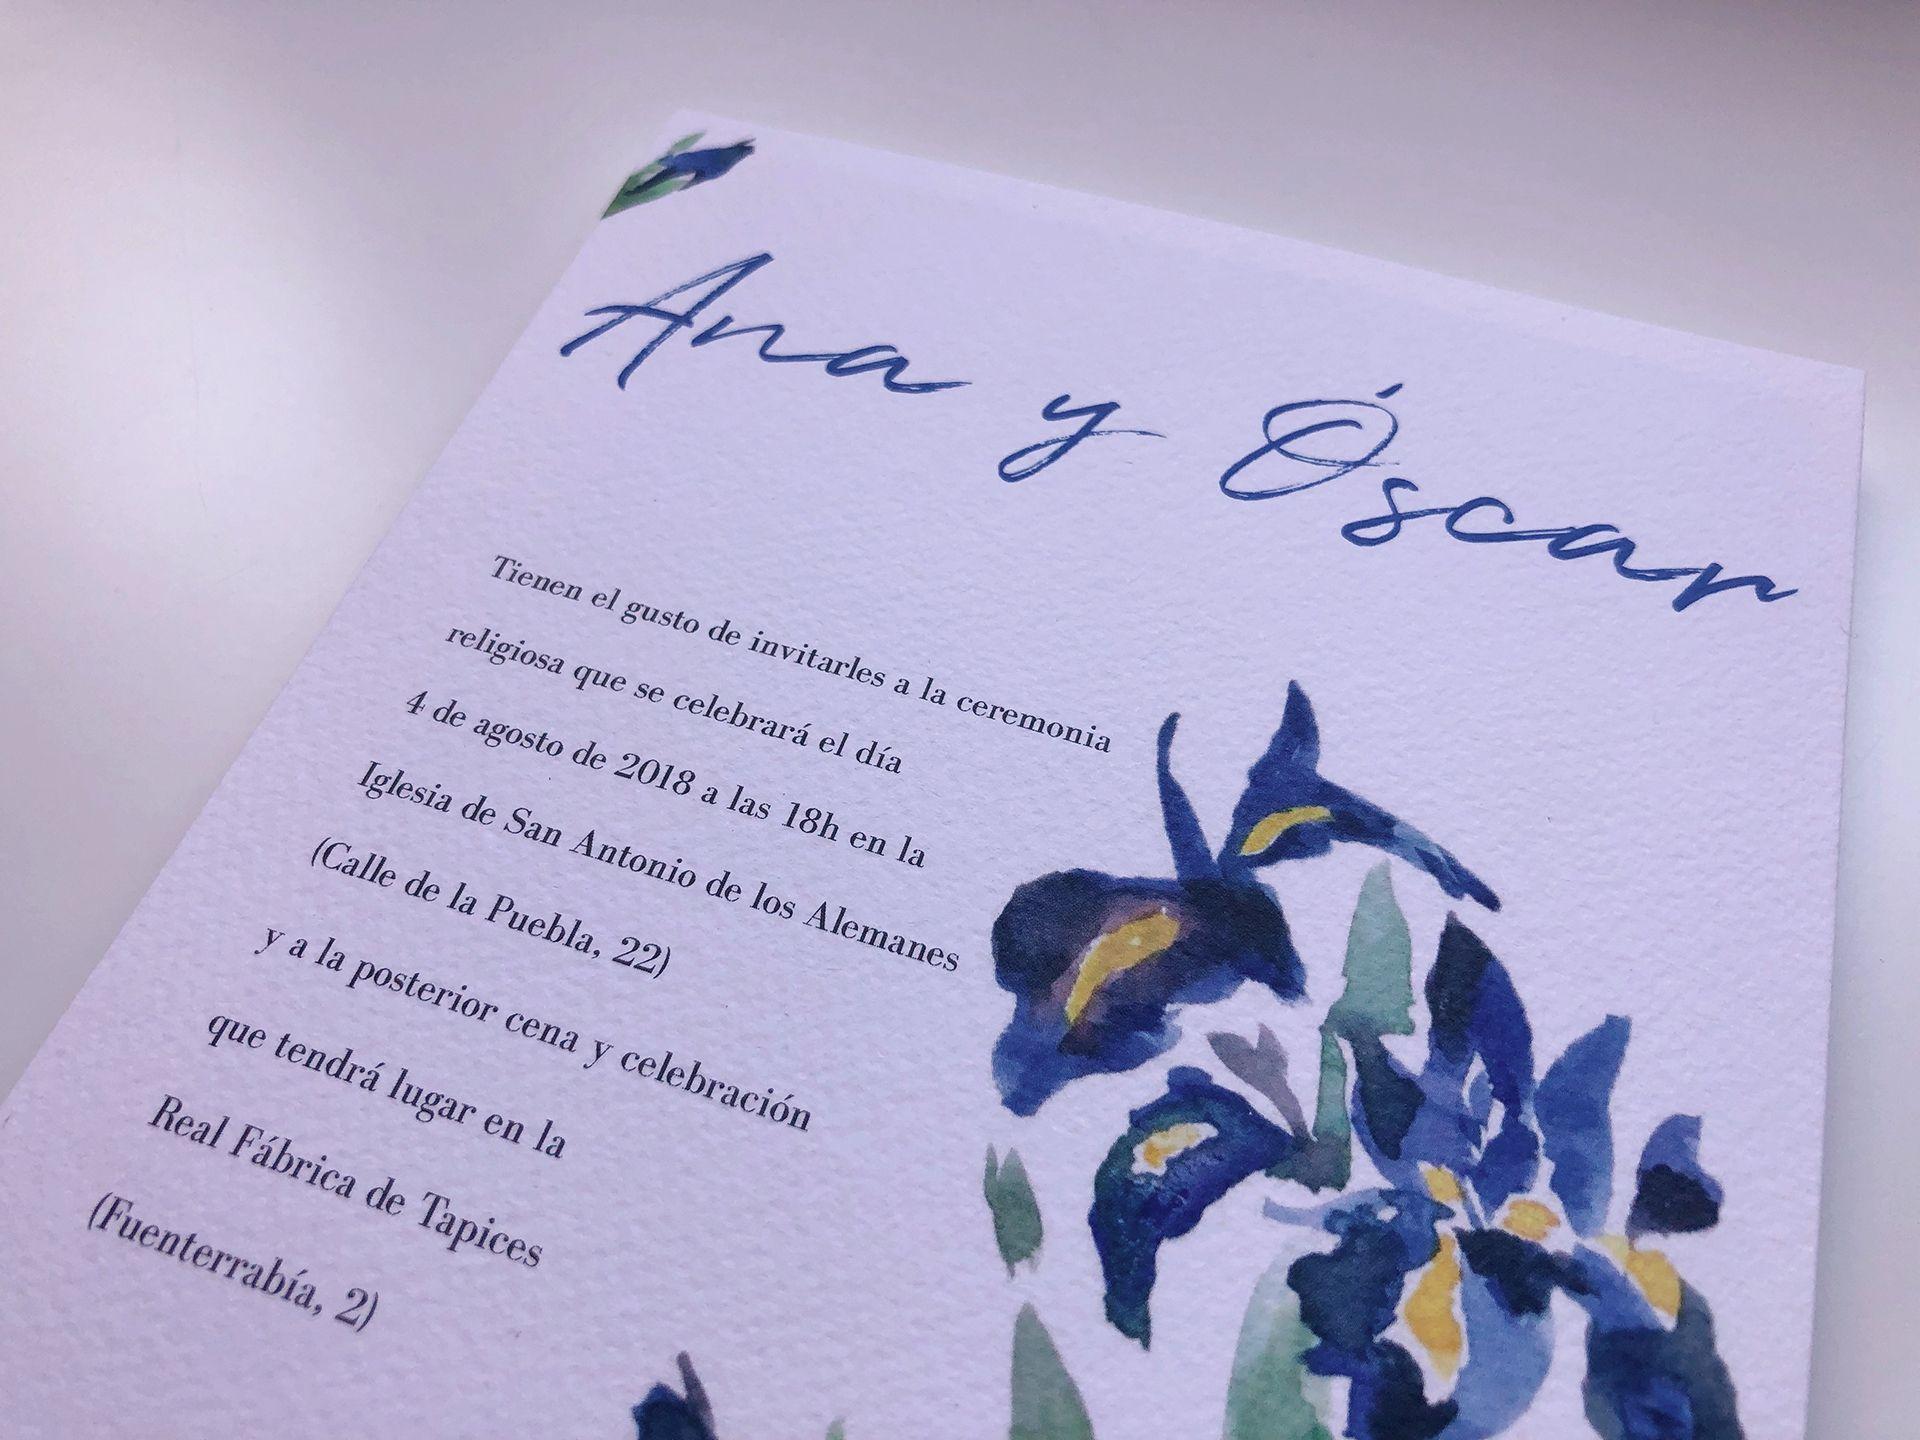 invitacion de boda con acuarela artesanal